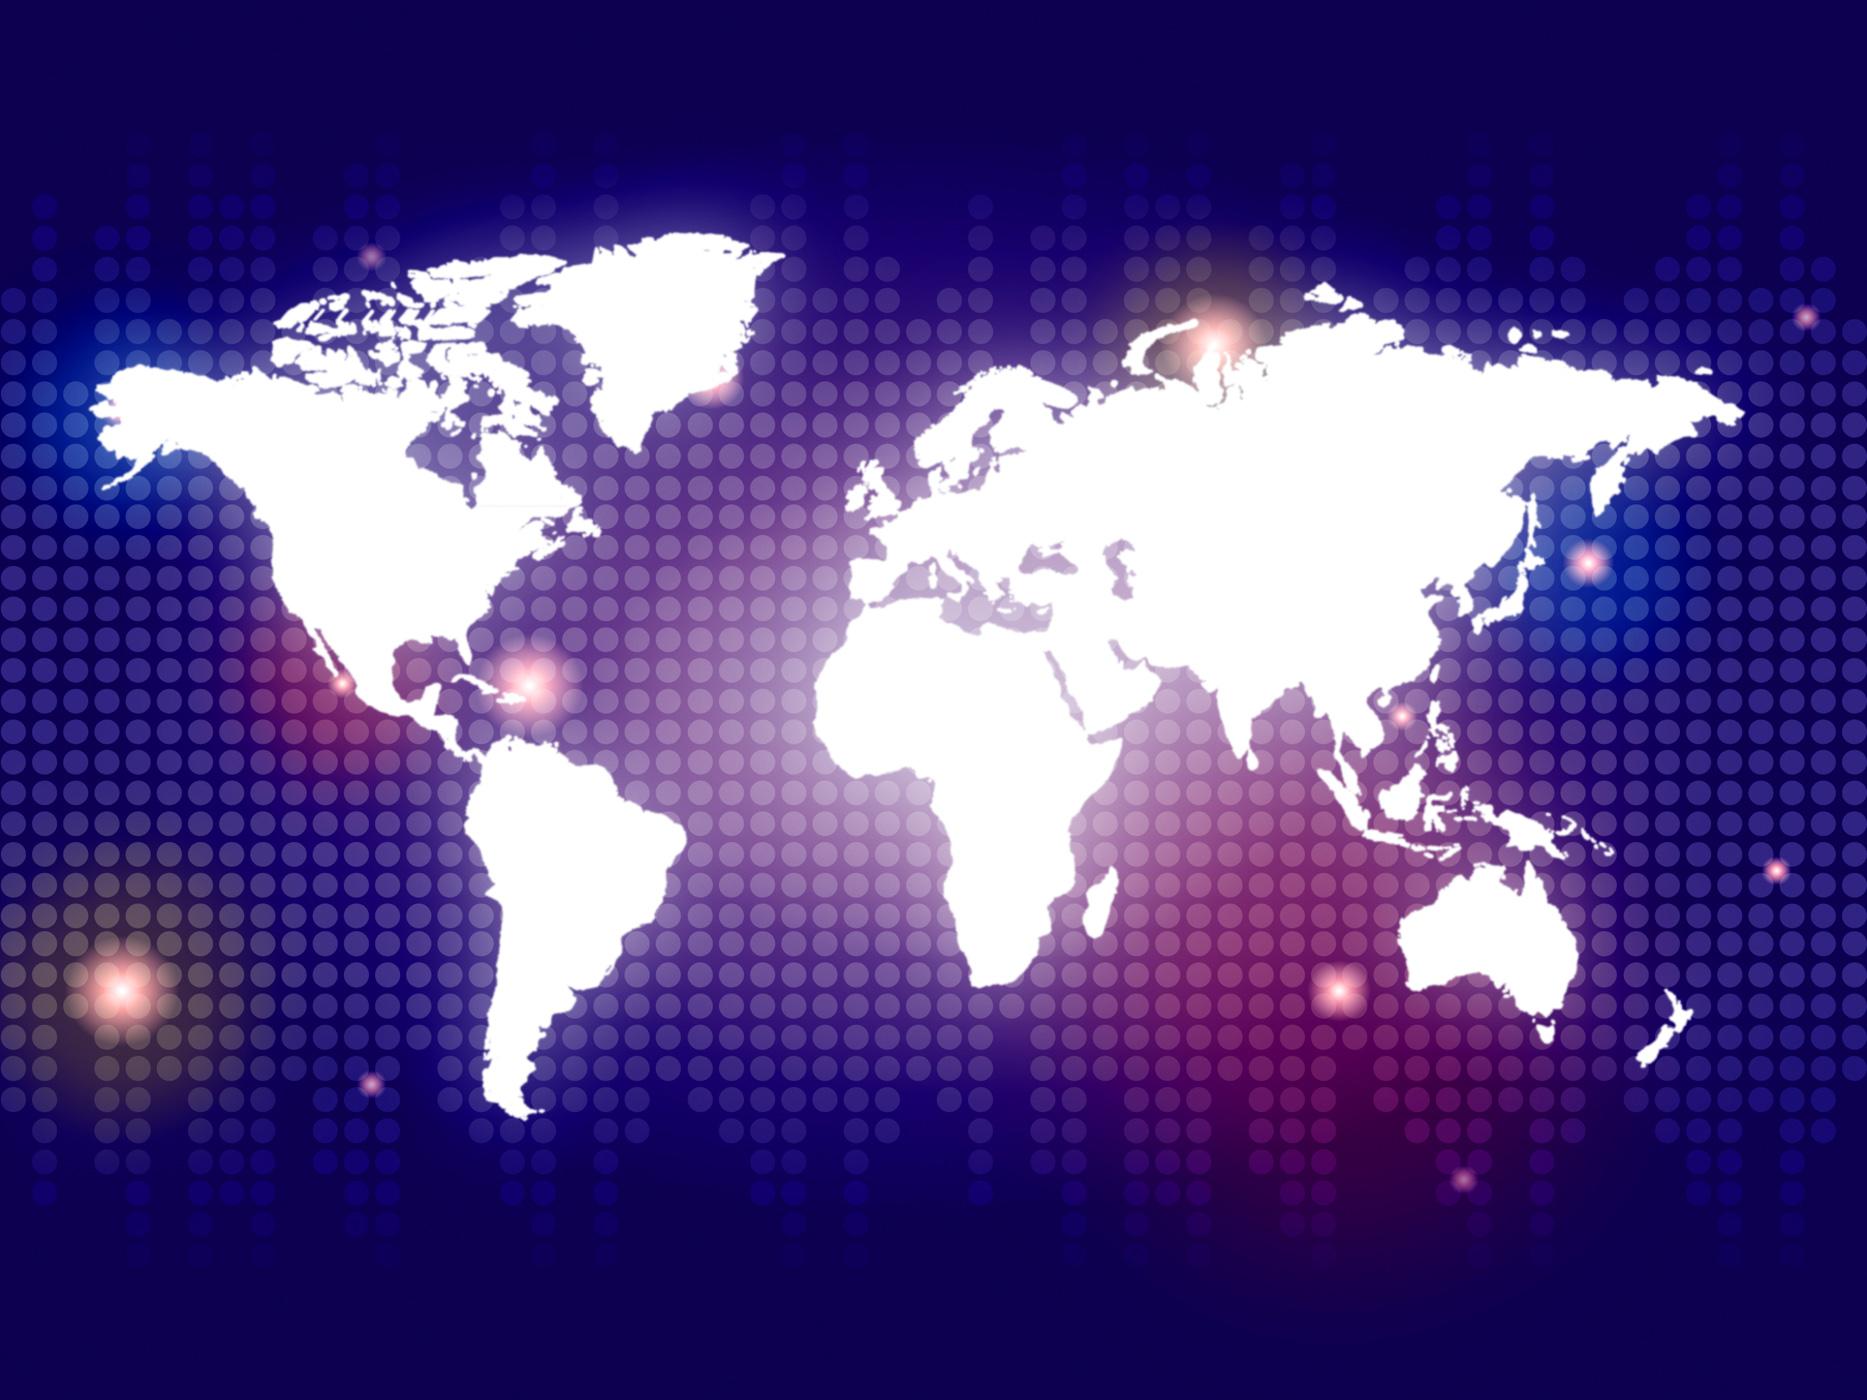 Blue world shows globalization backdrop and globe photo